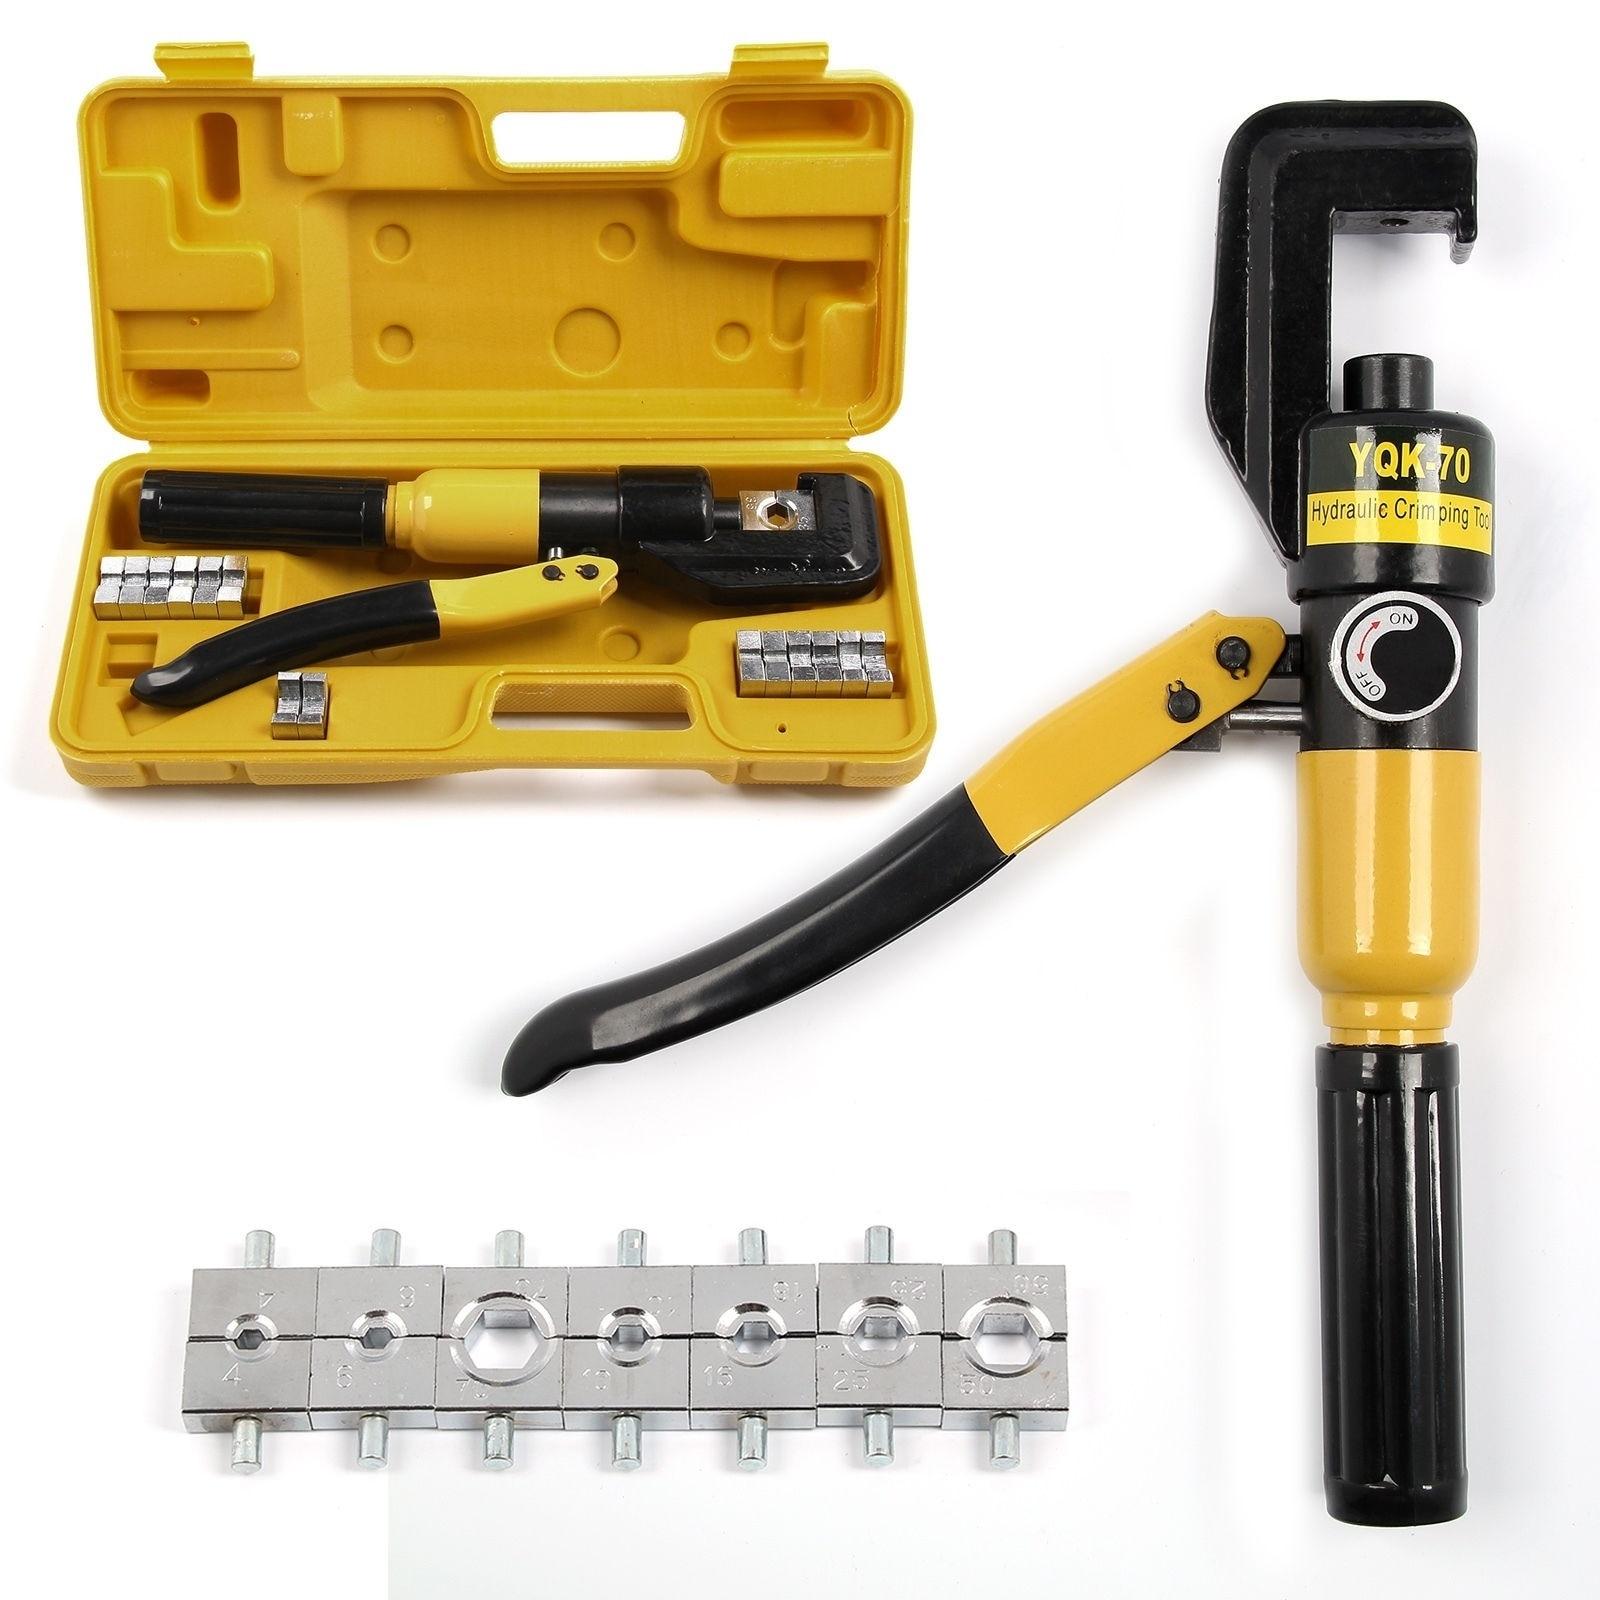 6 T Hydraulische Crimper Tool Kit Rohr Terminals Lugs Batterie Draht Crimpen Kraft